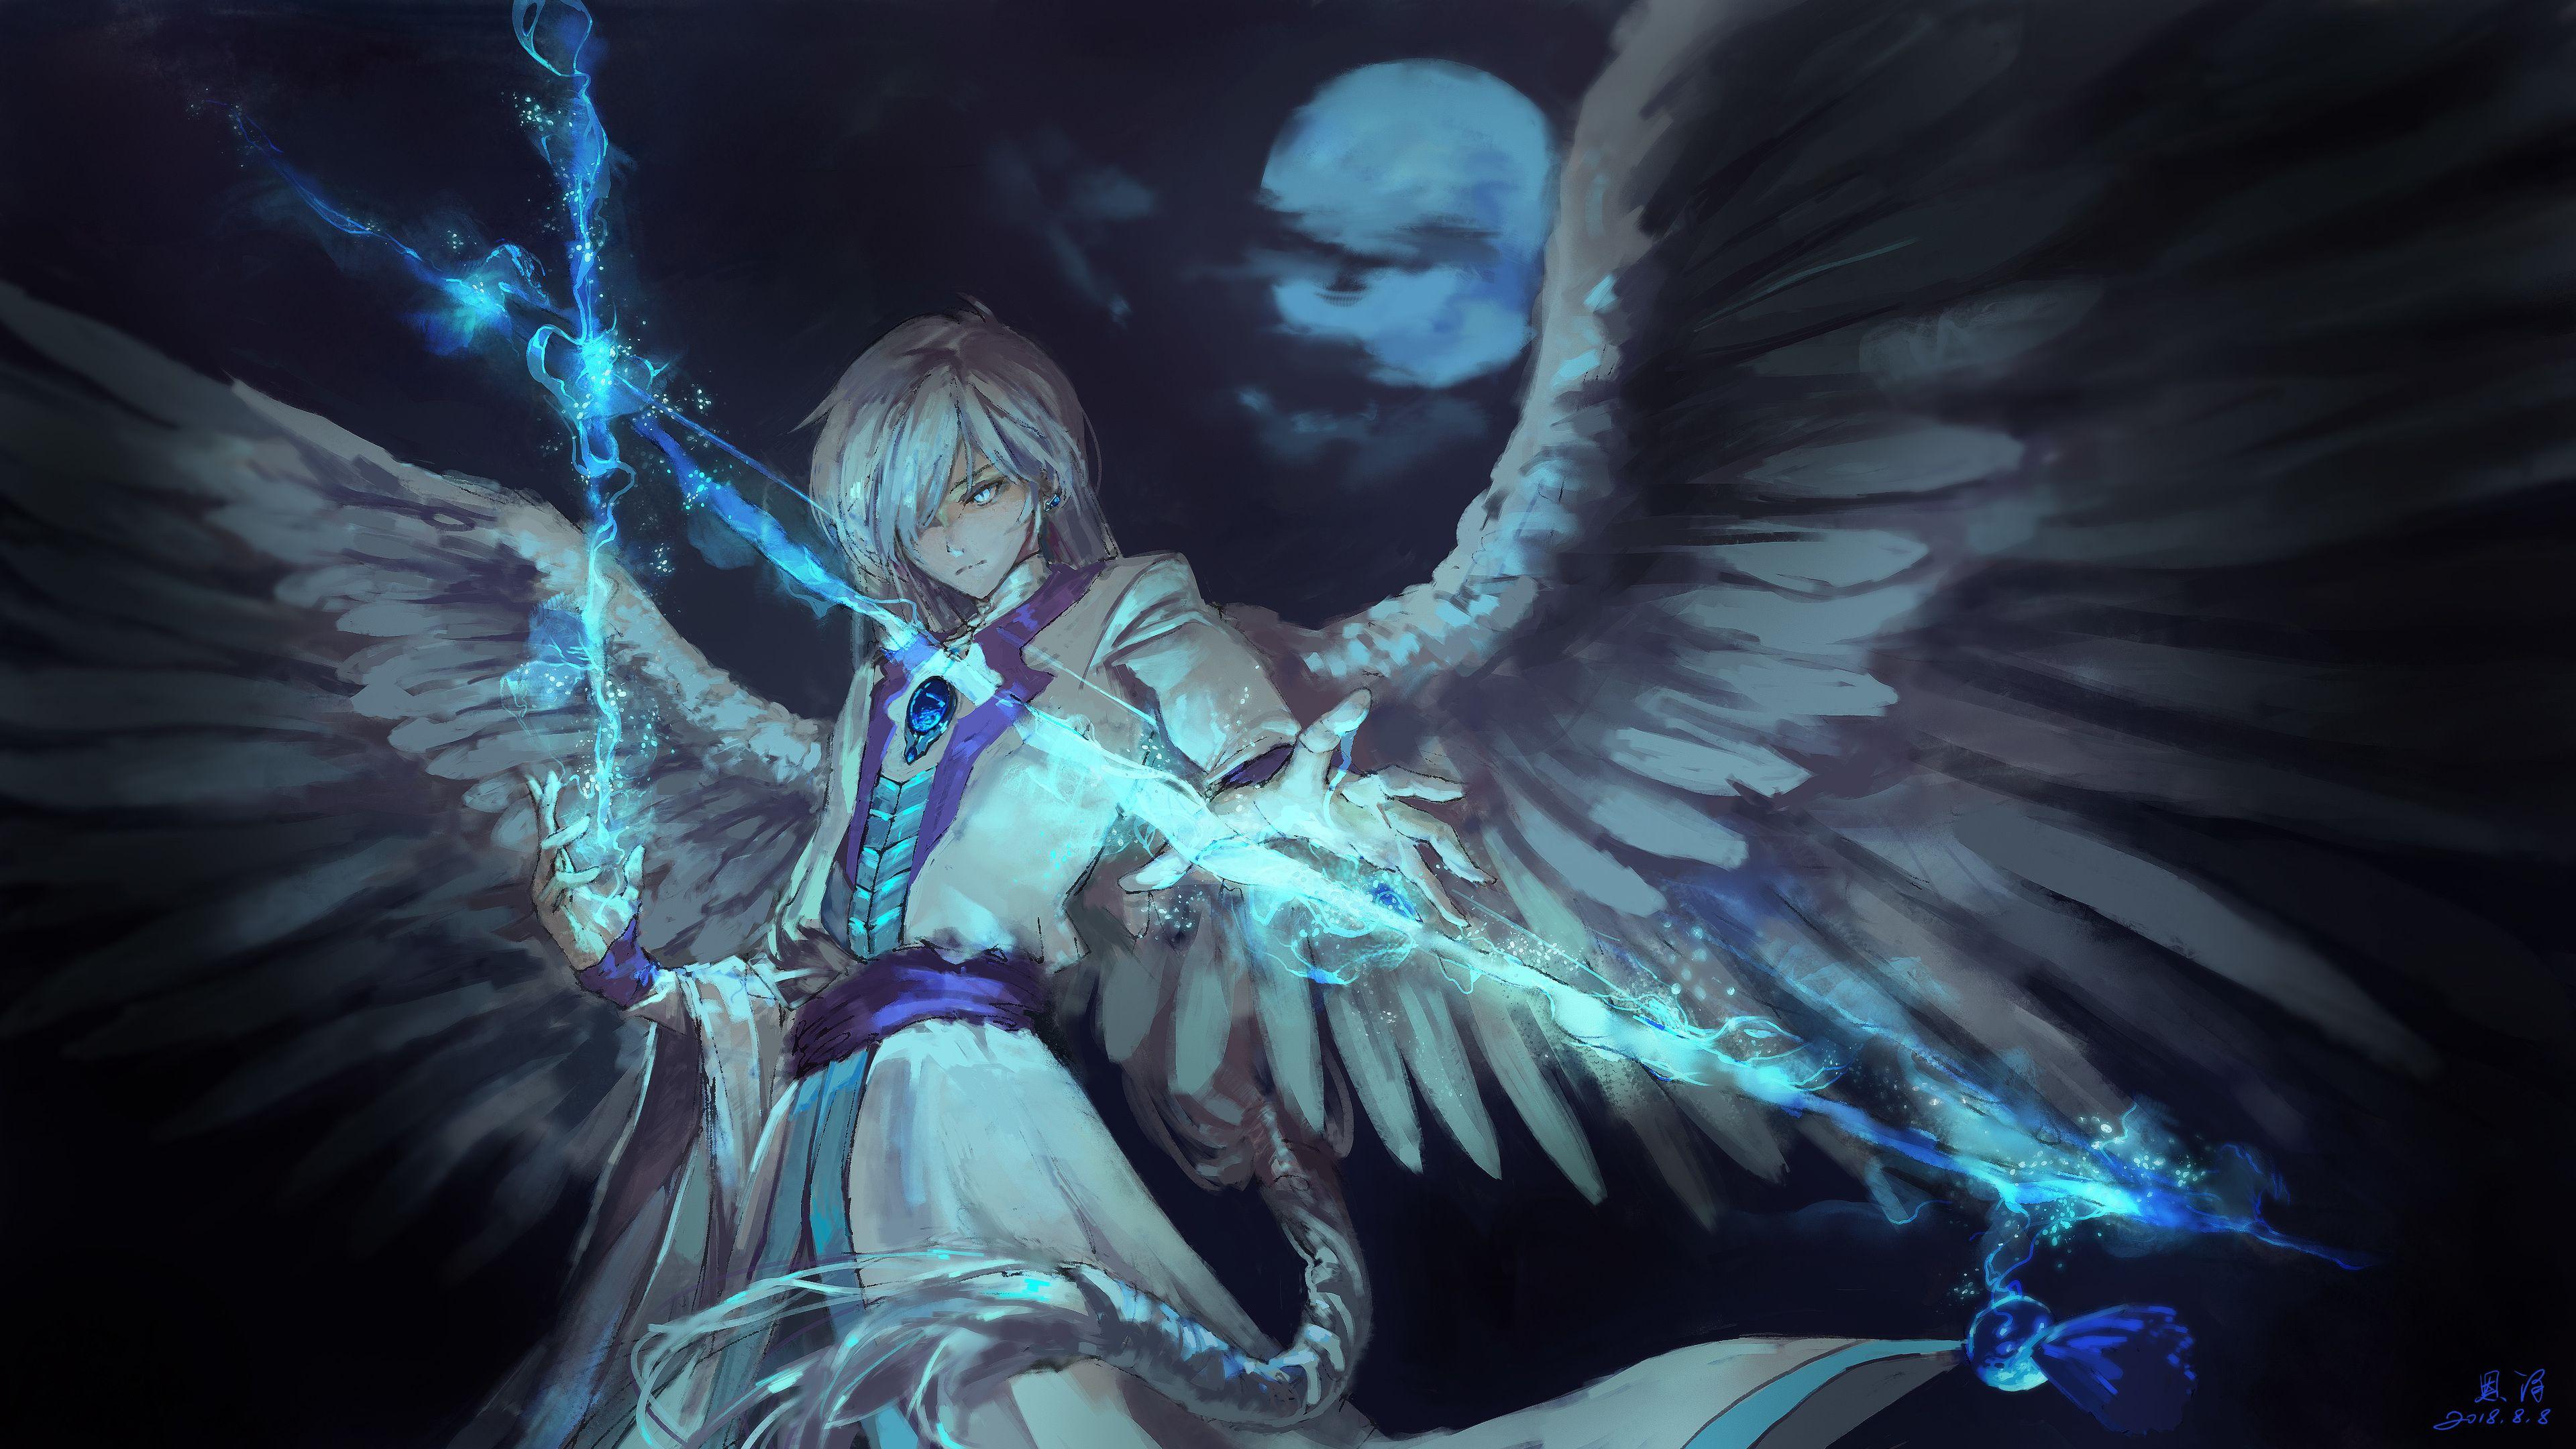 Anime Angel Boy With Magical Arrow Hd Wallpapers Anime Wallpapers 4k Wallpapers Anime Angel Cardcaptor Sakura Anime Angel Girl